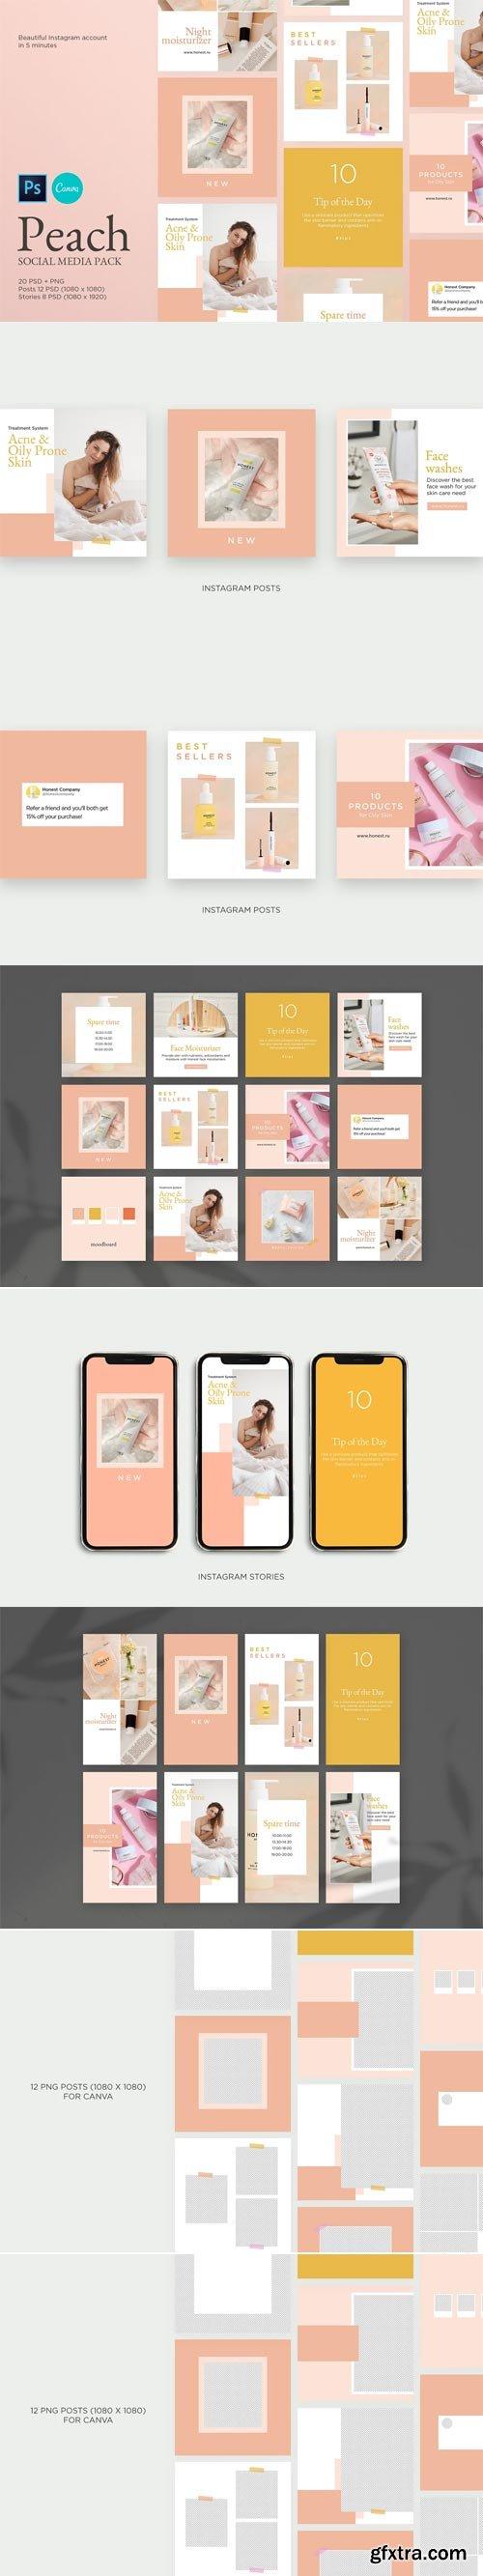 CreativeMarket - Peach Instagram Templates Pack - 4827213